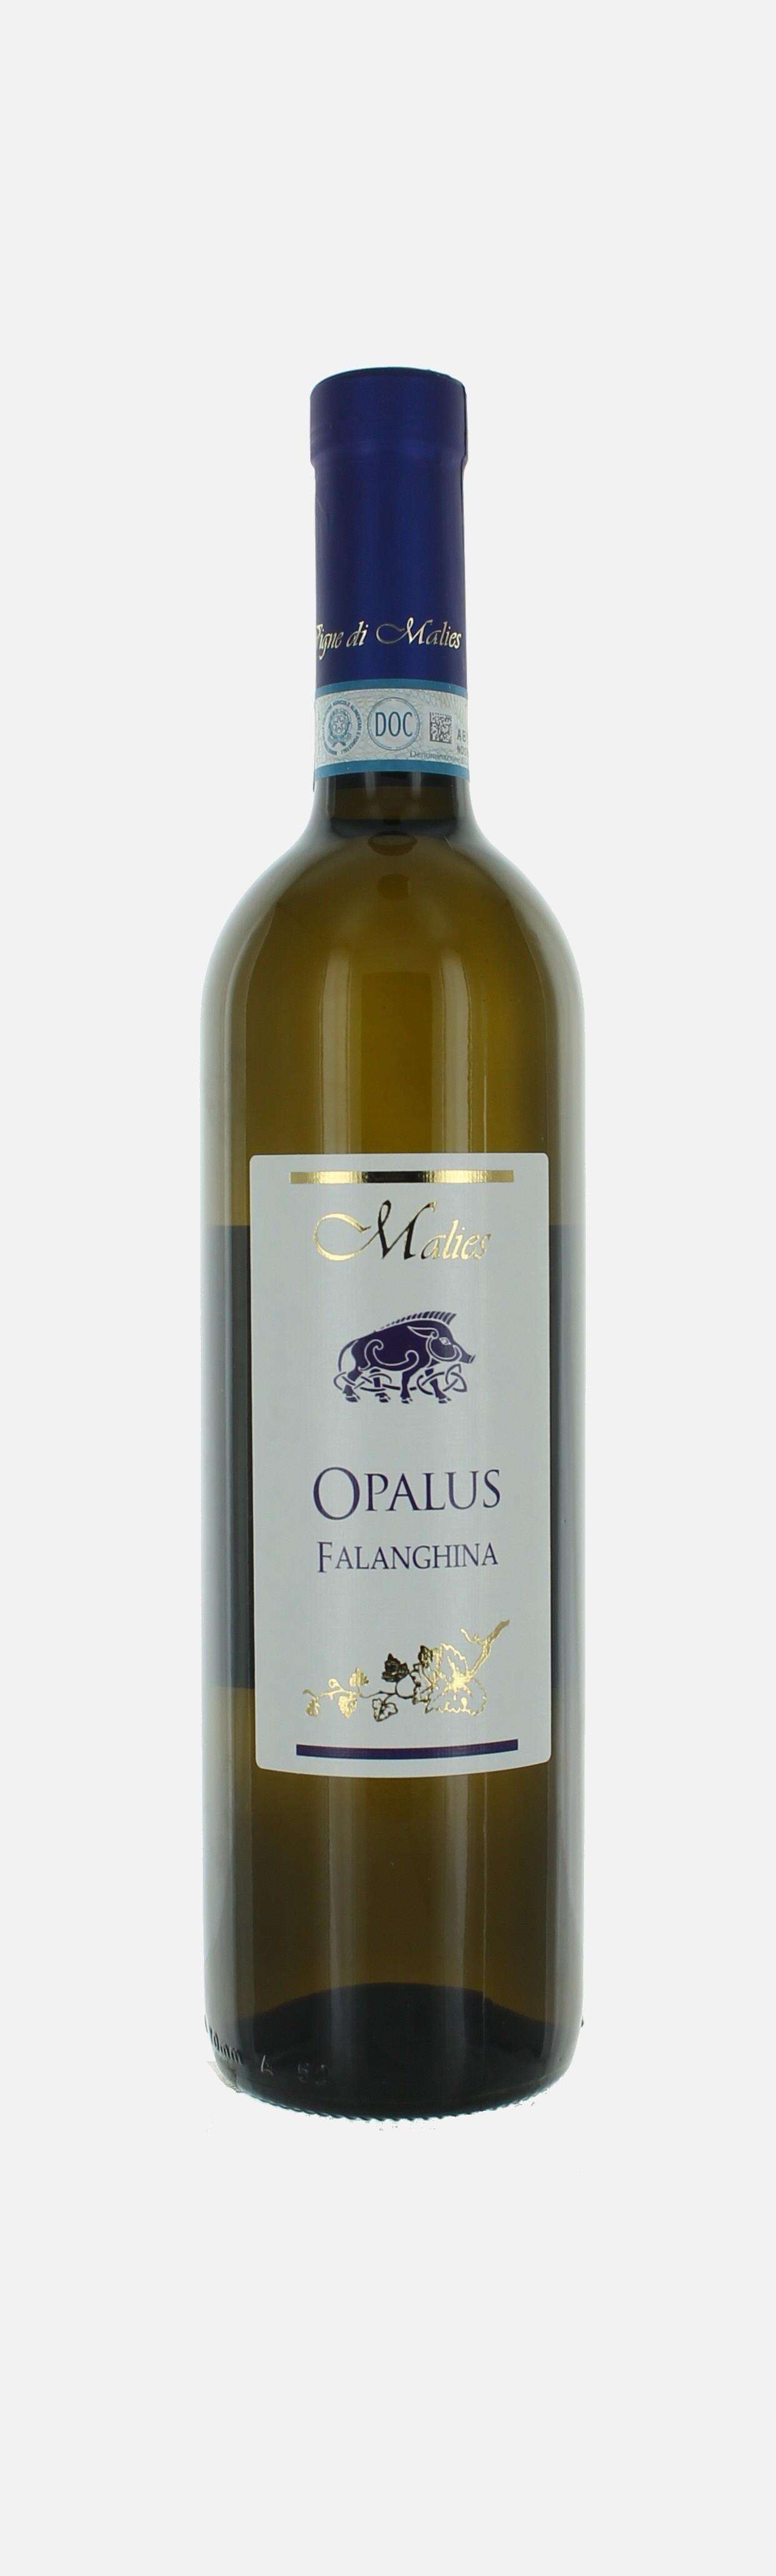 Opalus, Falanghina del Sannio DOC, Vigne de Malies